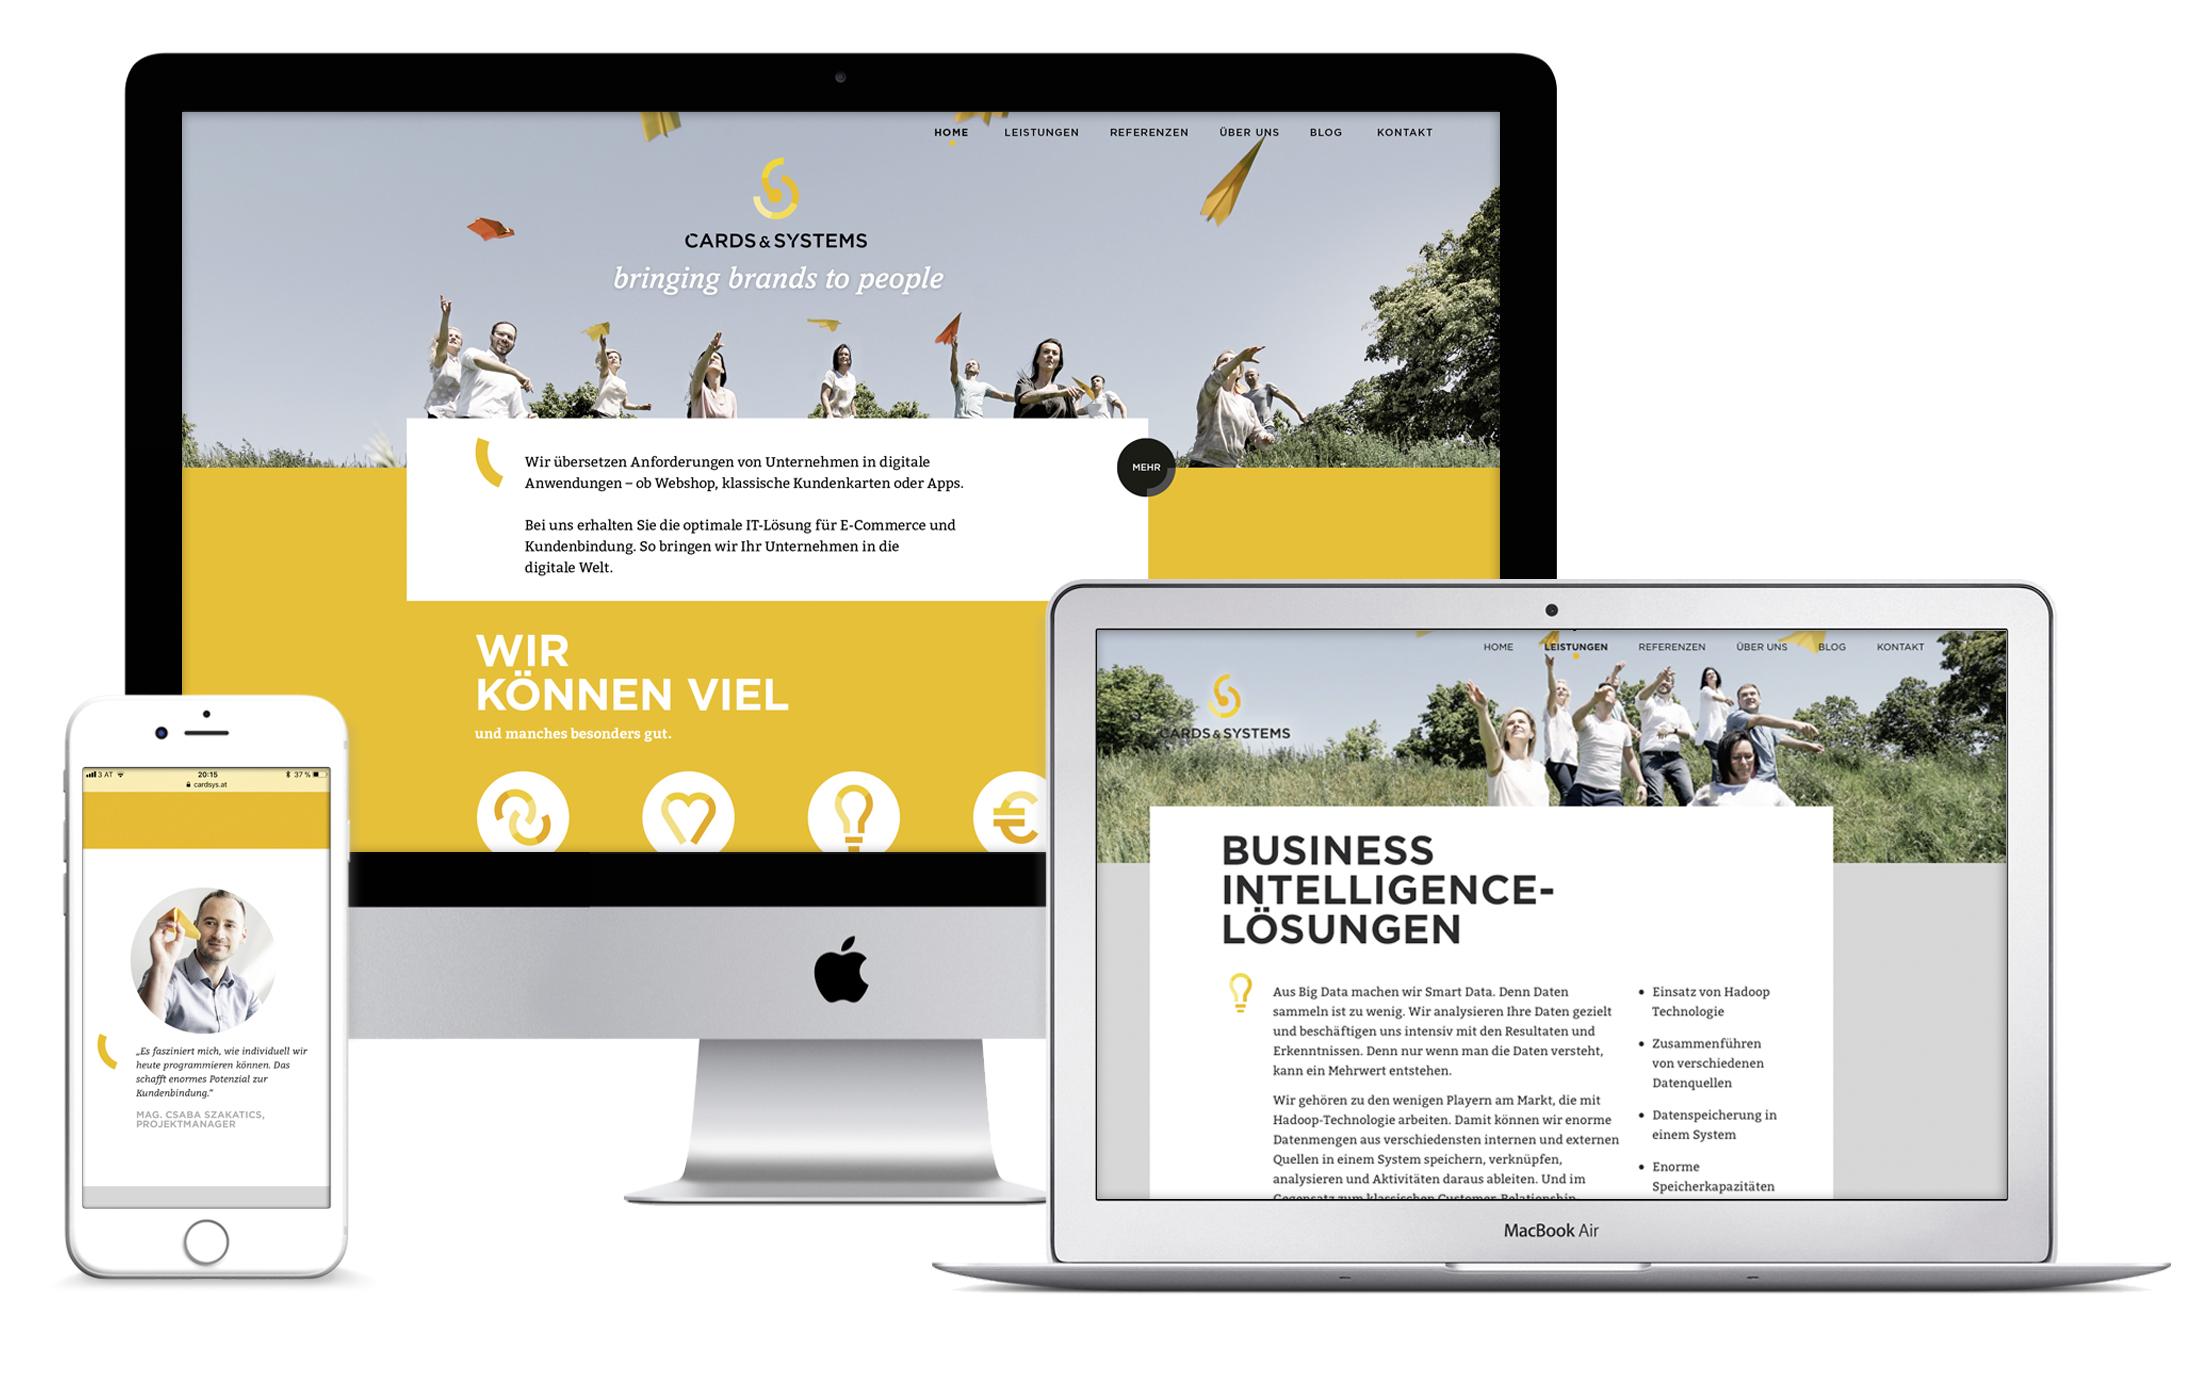 cs-homepage-auf-apple-bildschirmen-2